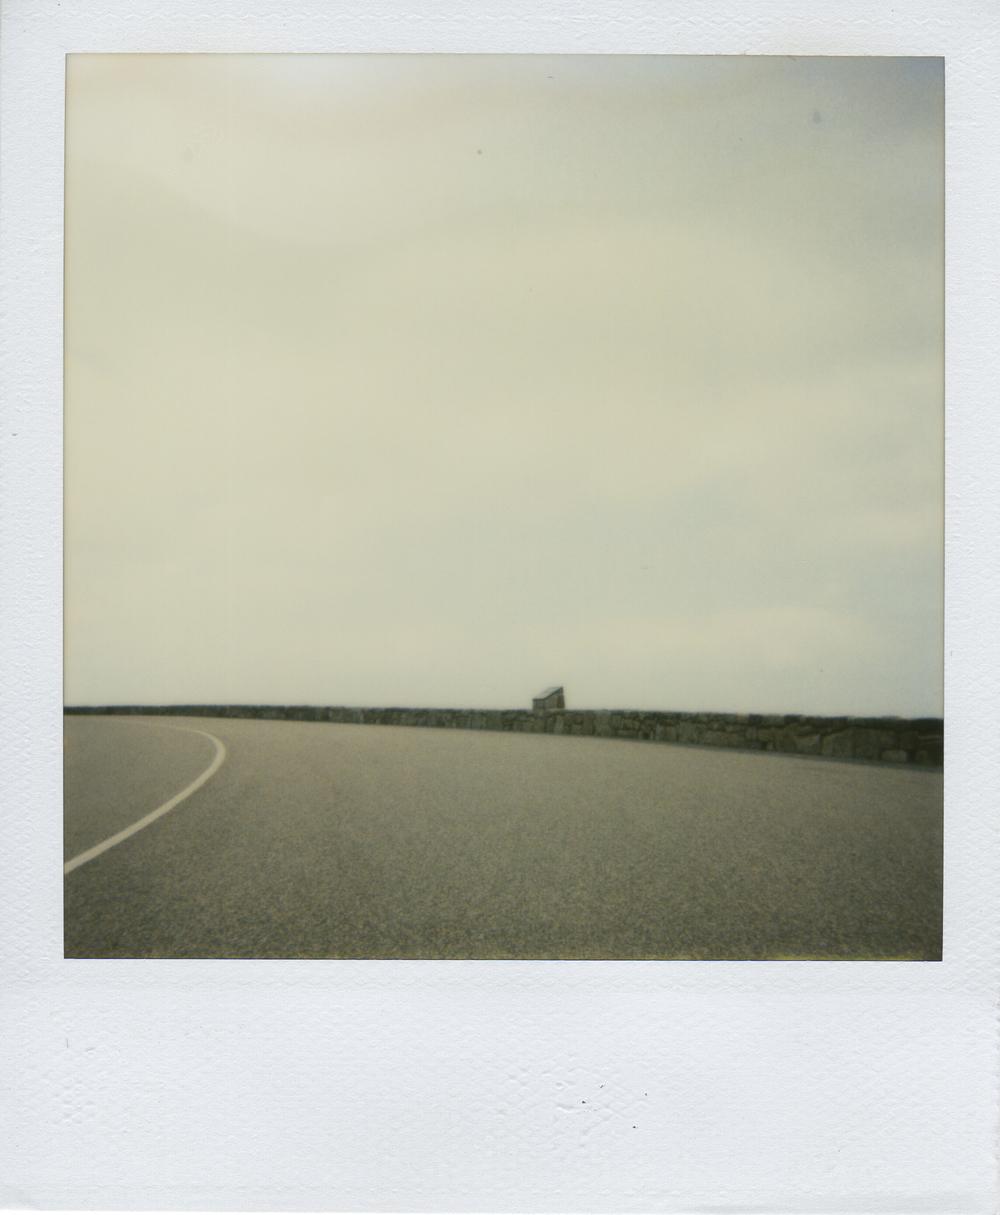 jlaurence-polaroid-034.jpg